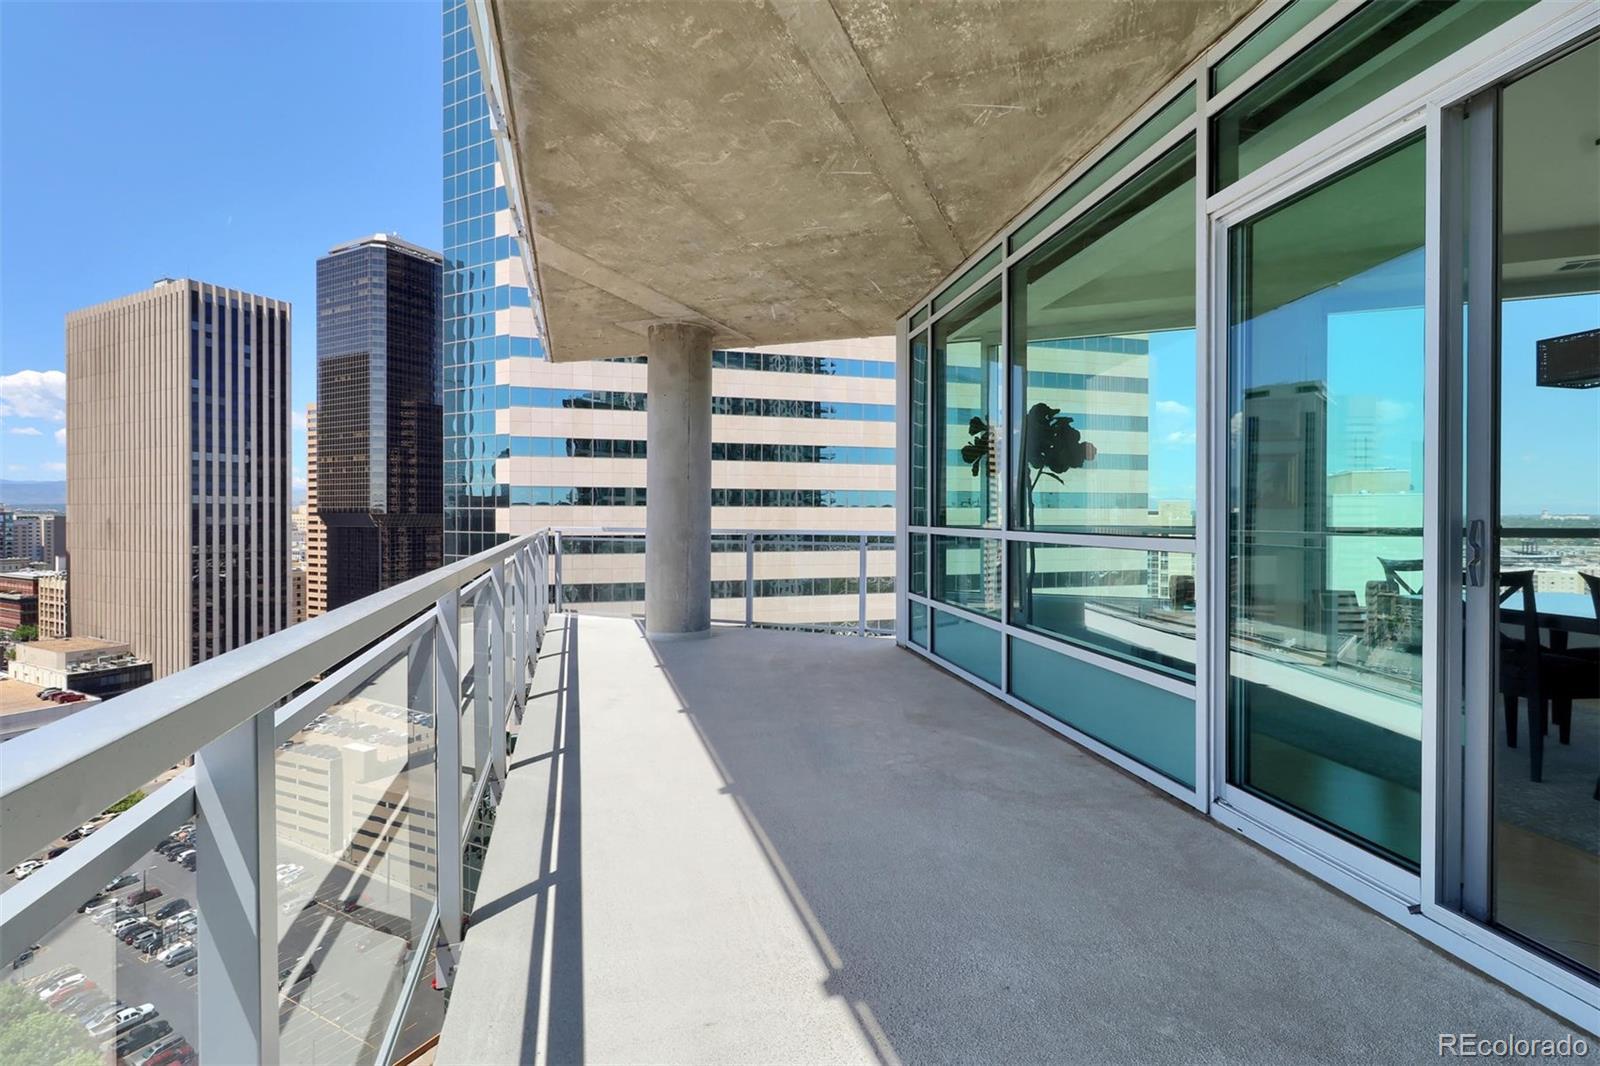 MLS# 7793144 - 23 - 2001 Lincoln Street #2011-L, Denver, CO 80202